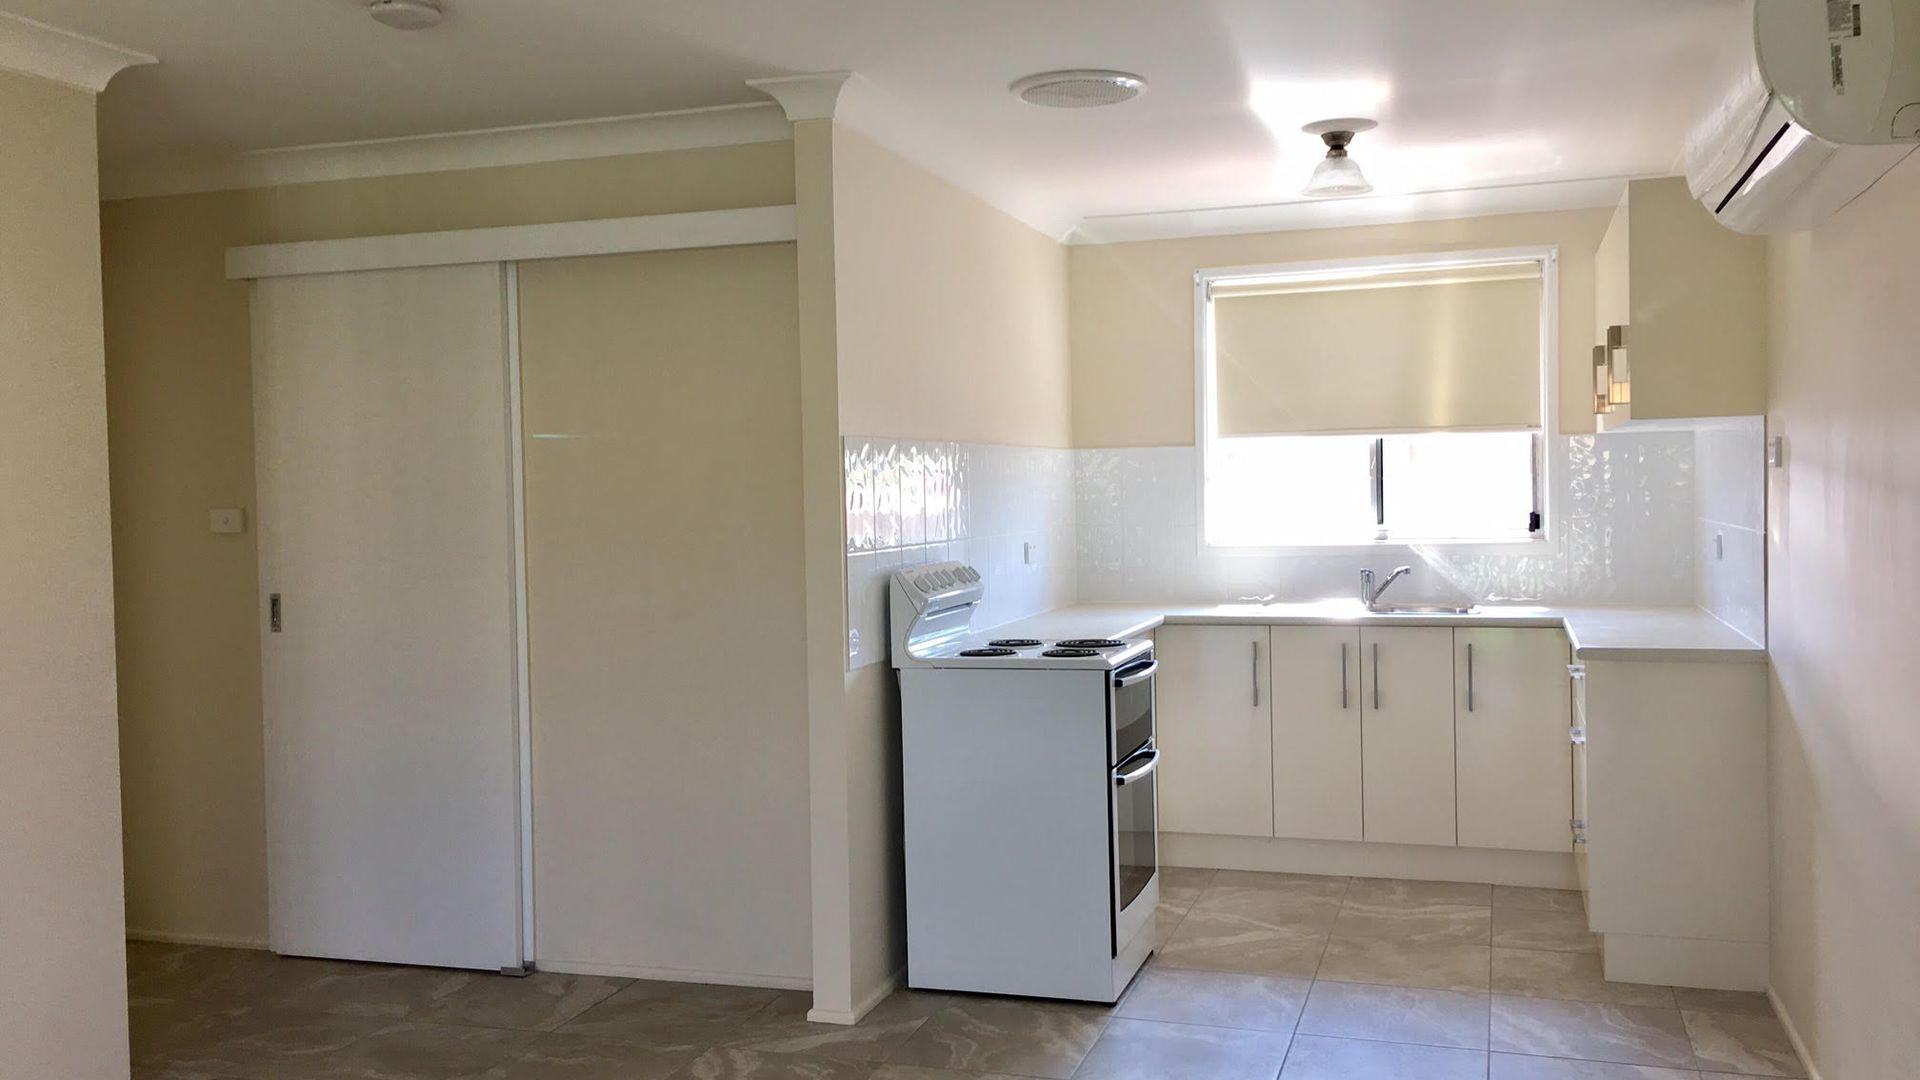 3, 10 Goobar Street, Narrabri NSW 2390, Image 1